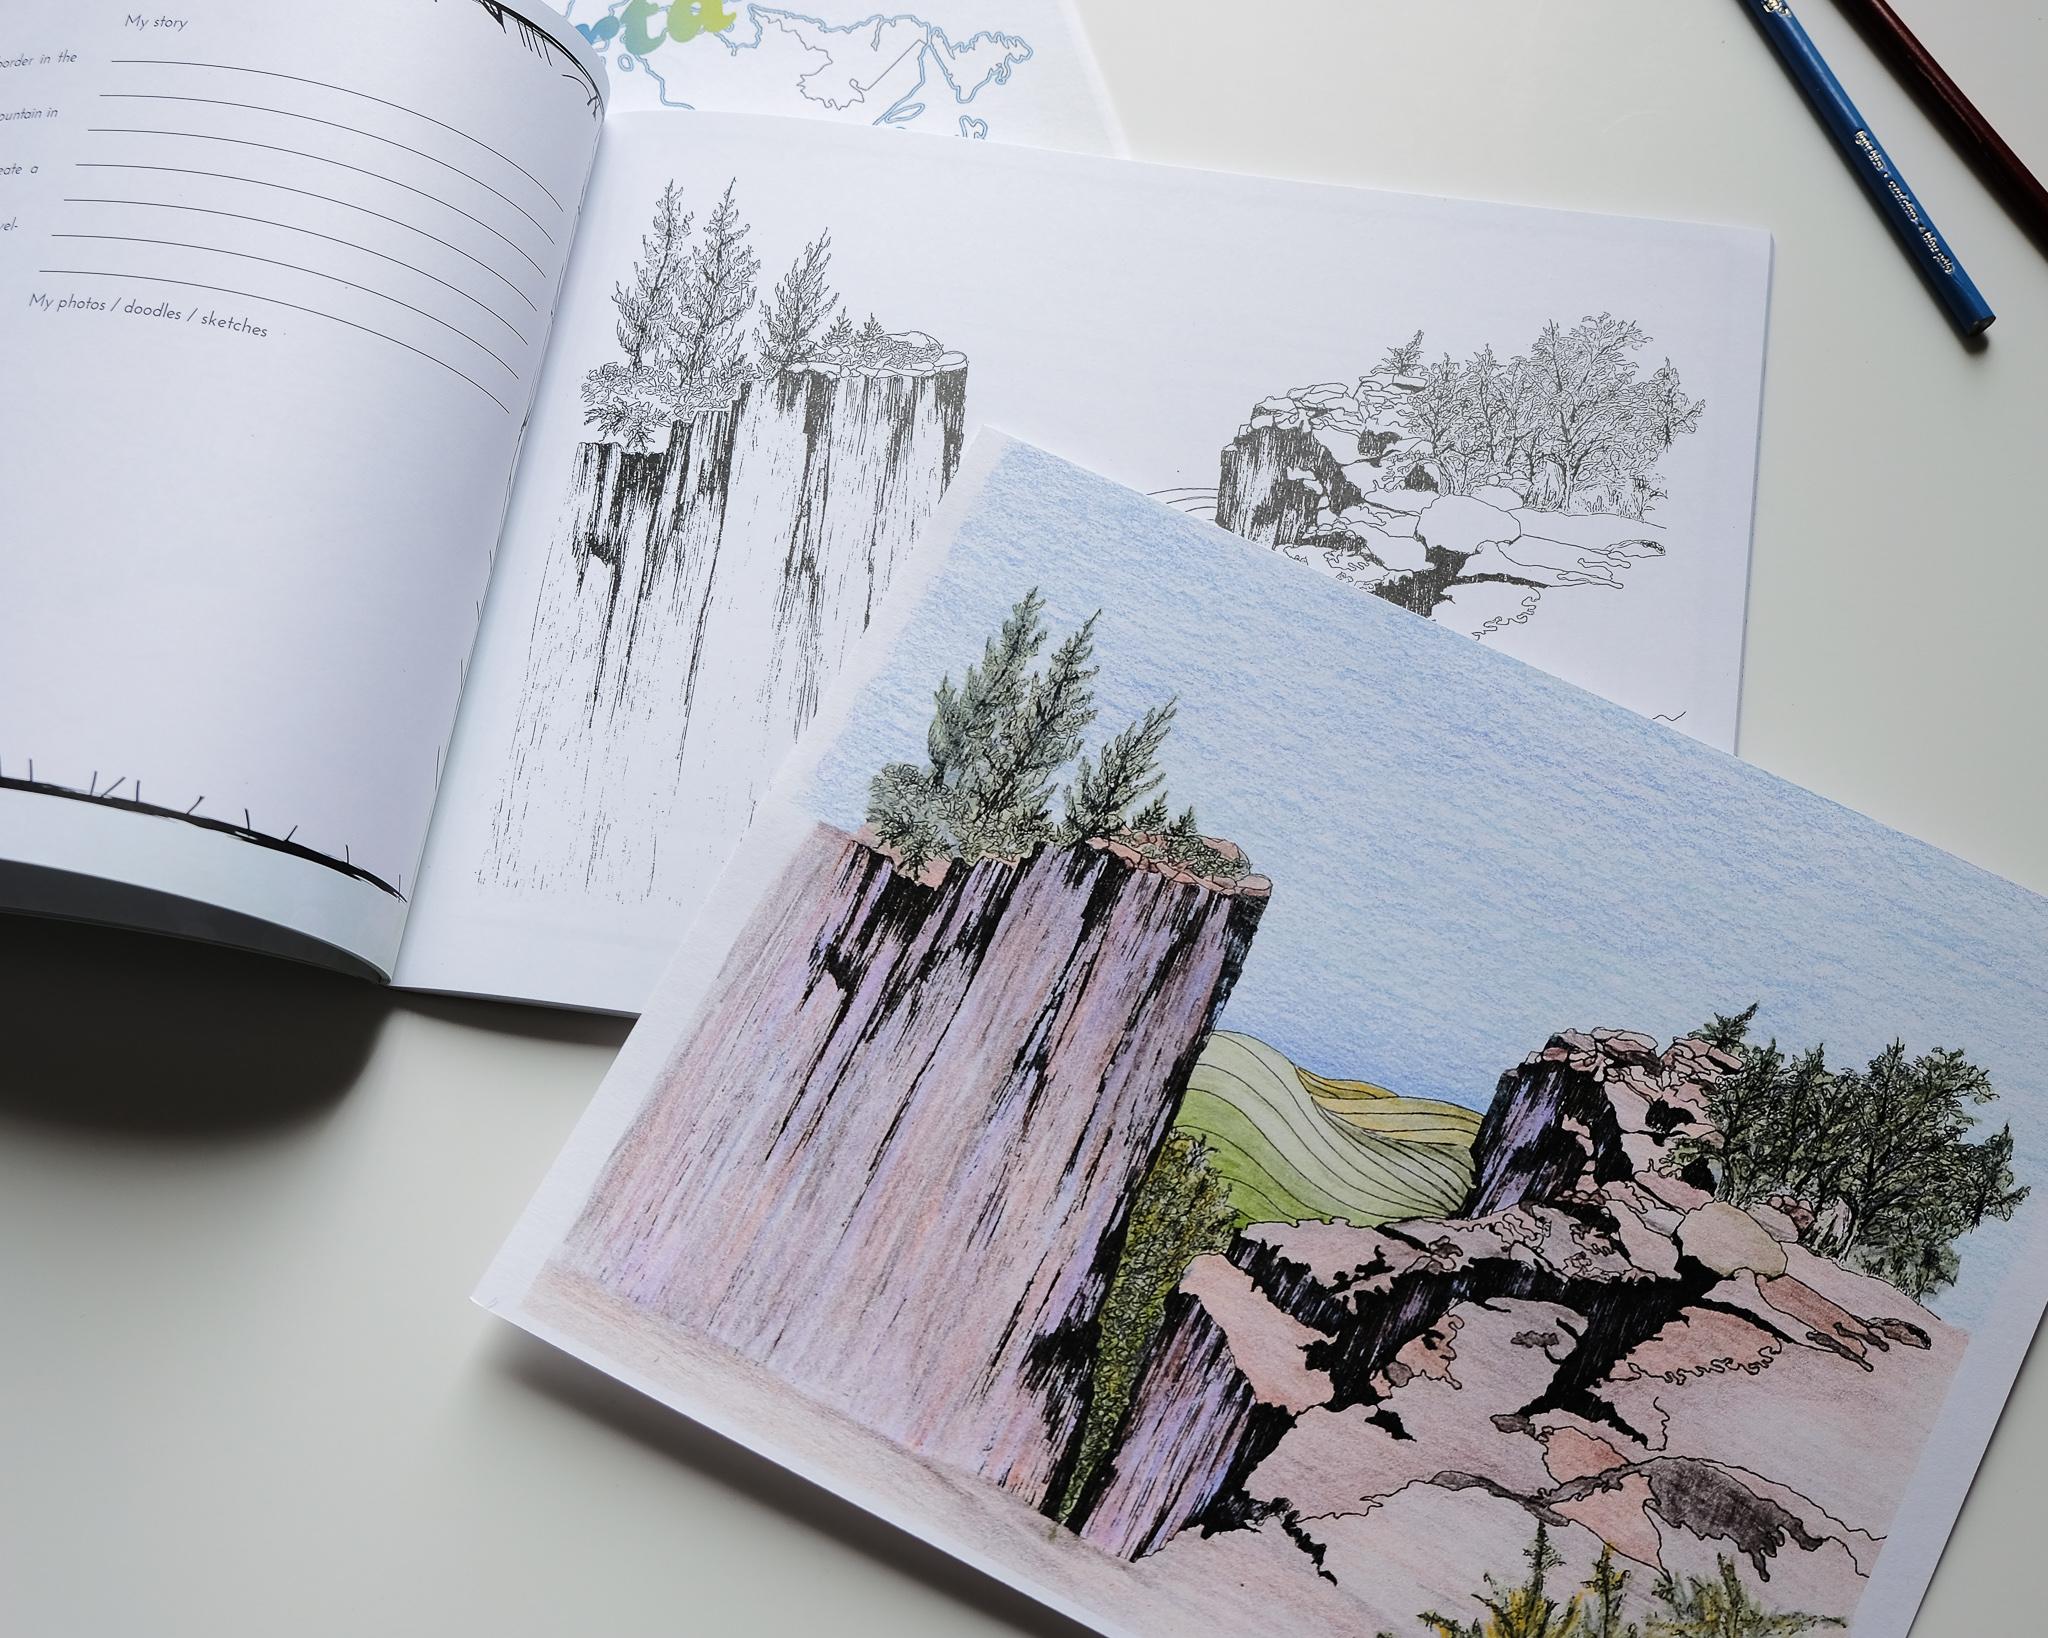 Alberta 2 - Sights of Canada - Activity Book